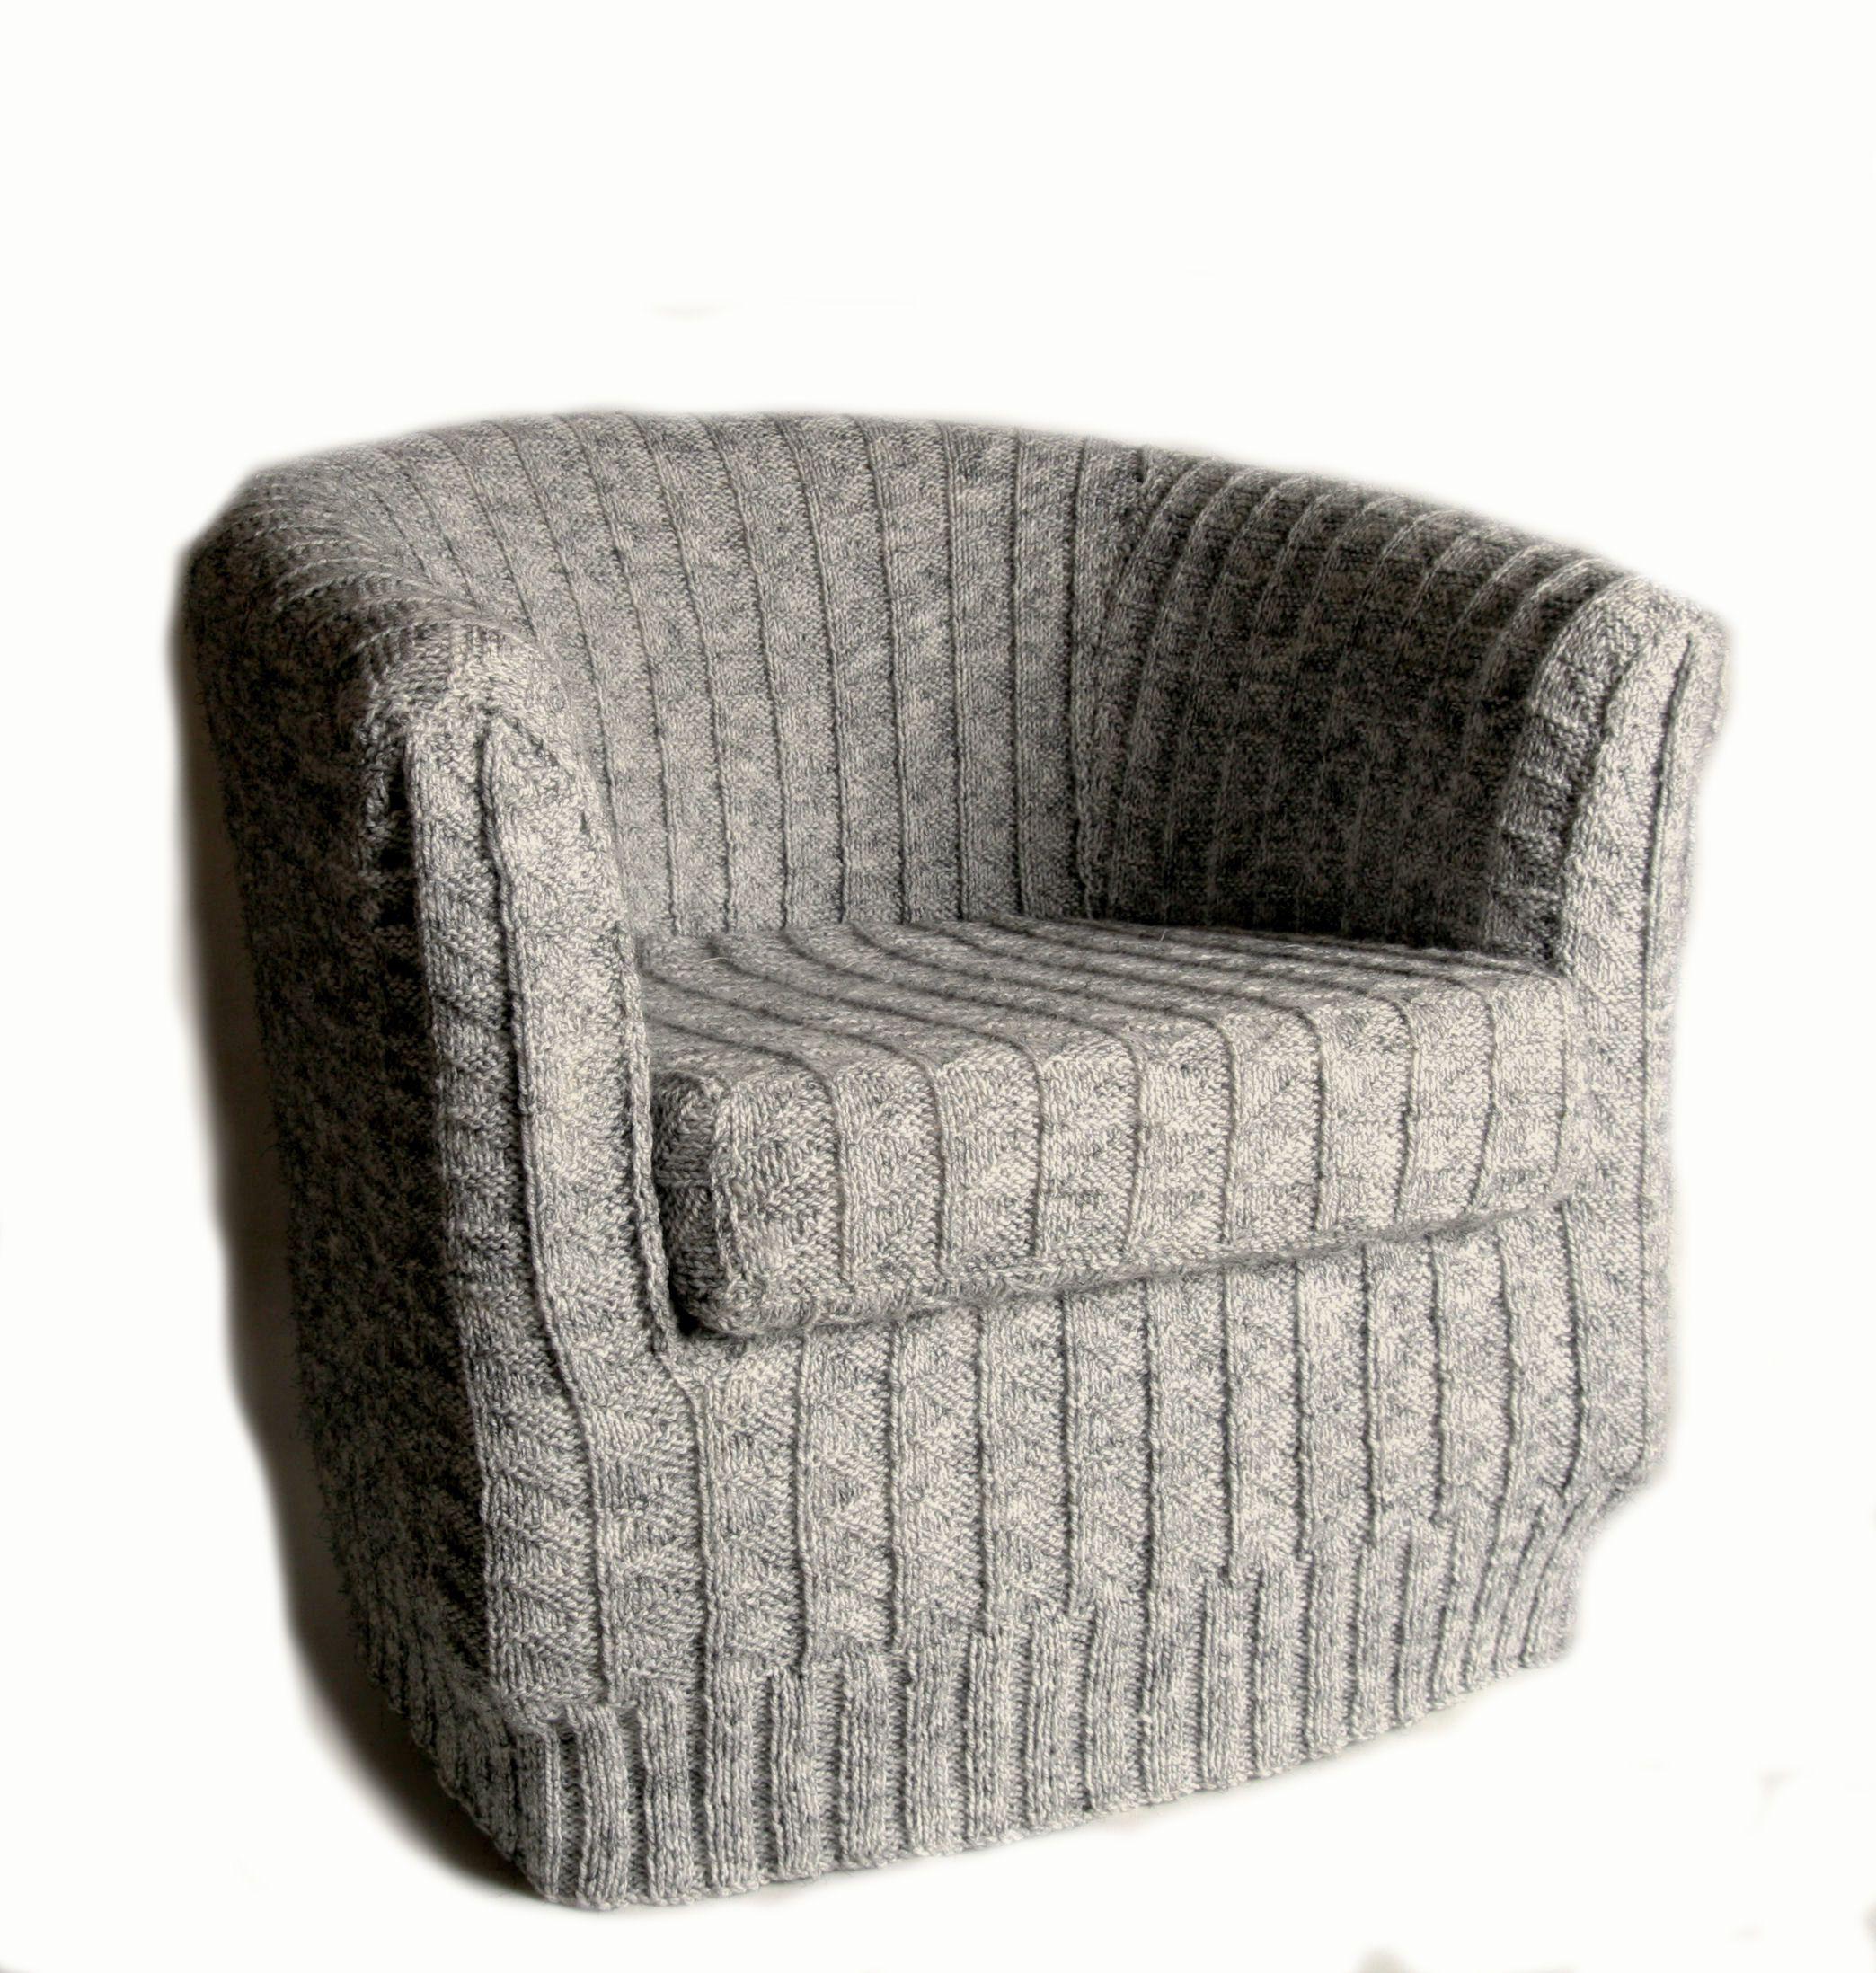 tub chair covers ireland koken barber chairs www sham store sneak peak at aw12 toft alpaca s knitted cover rh pinterest com australia